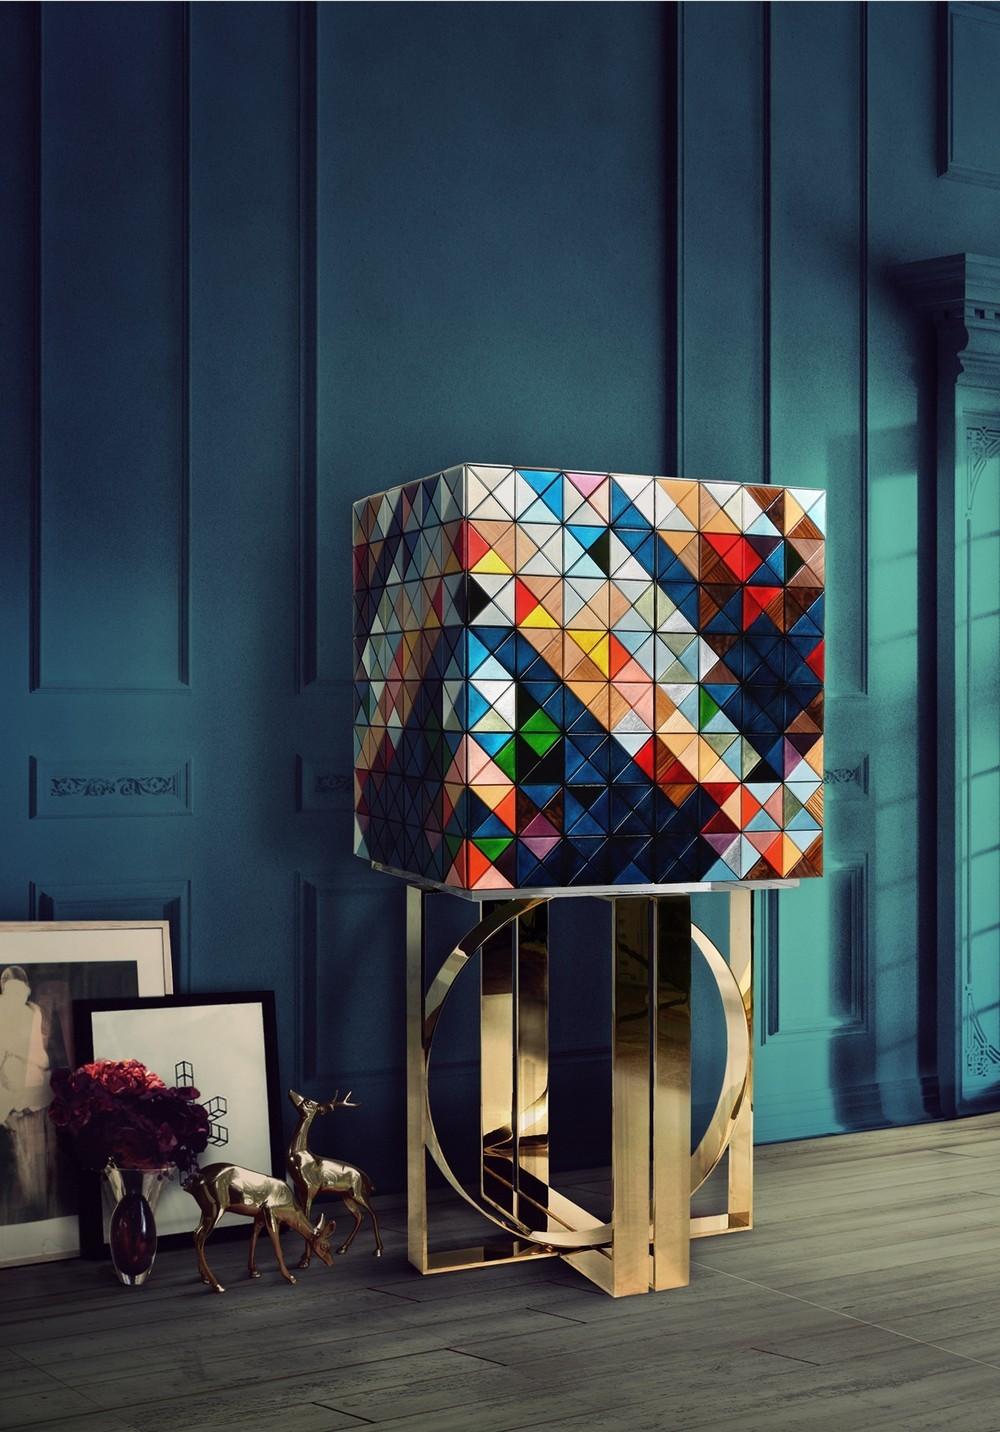 Diseño de Gabinetes: Ideas poderosas de interiores modernos diseño de gabinetes Diseño de Gabinetes: Ideas poderosas de interiores modernos pixel cabinet 04 zoom boca do lobo 2 1